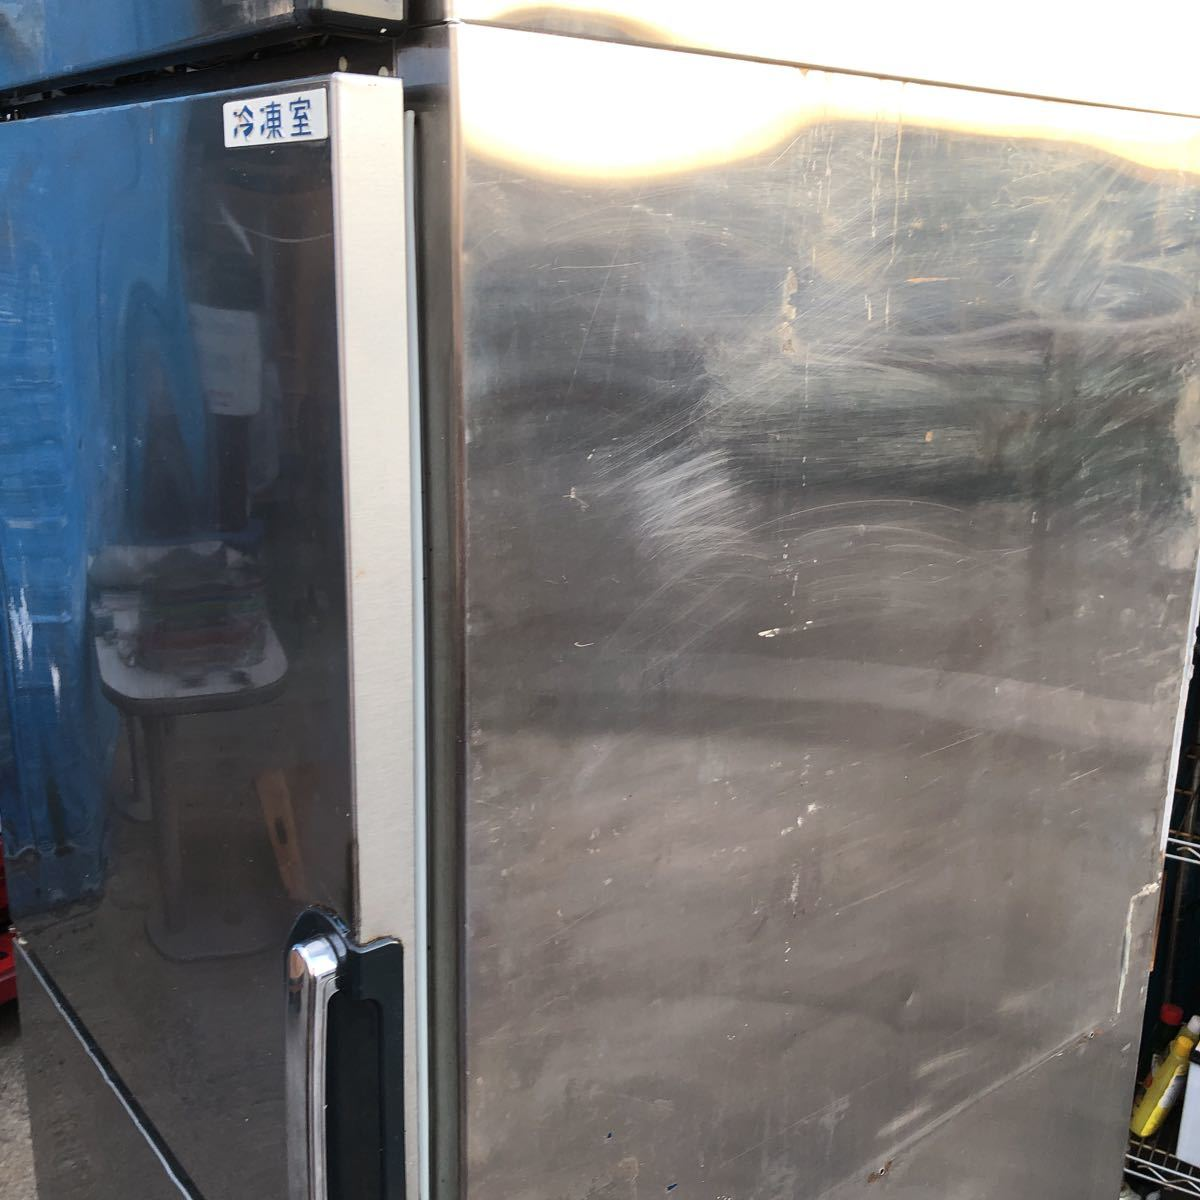 FUJIMAK フジマック 業務用冷凍冷蔵庫 FR7680FGD 2ドア 埼玉県ふじみ野市にて引取限定_画像3